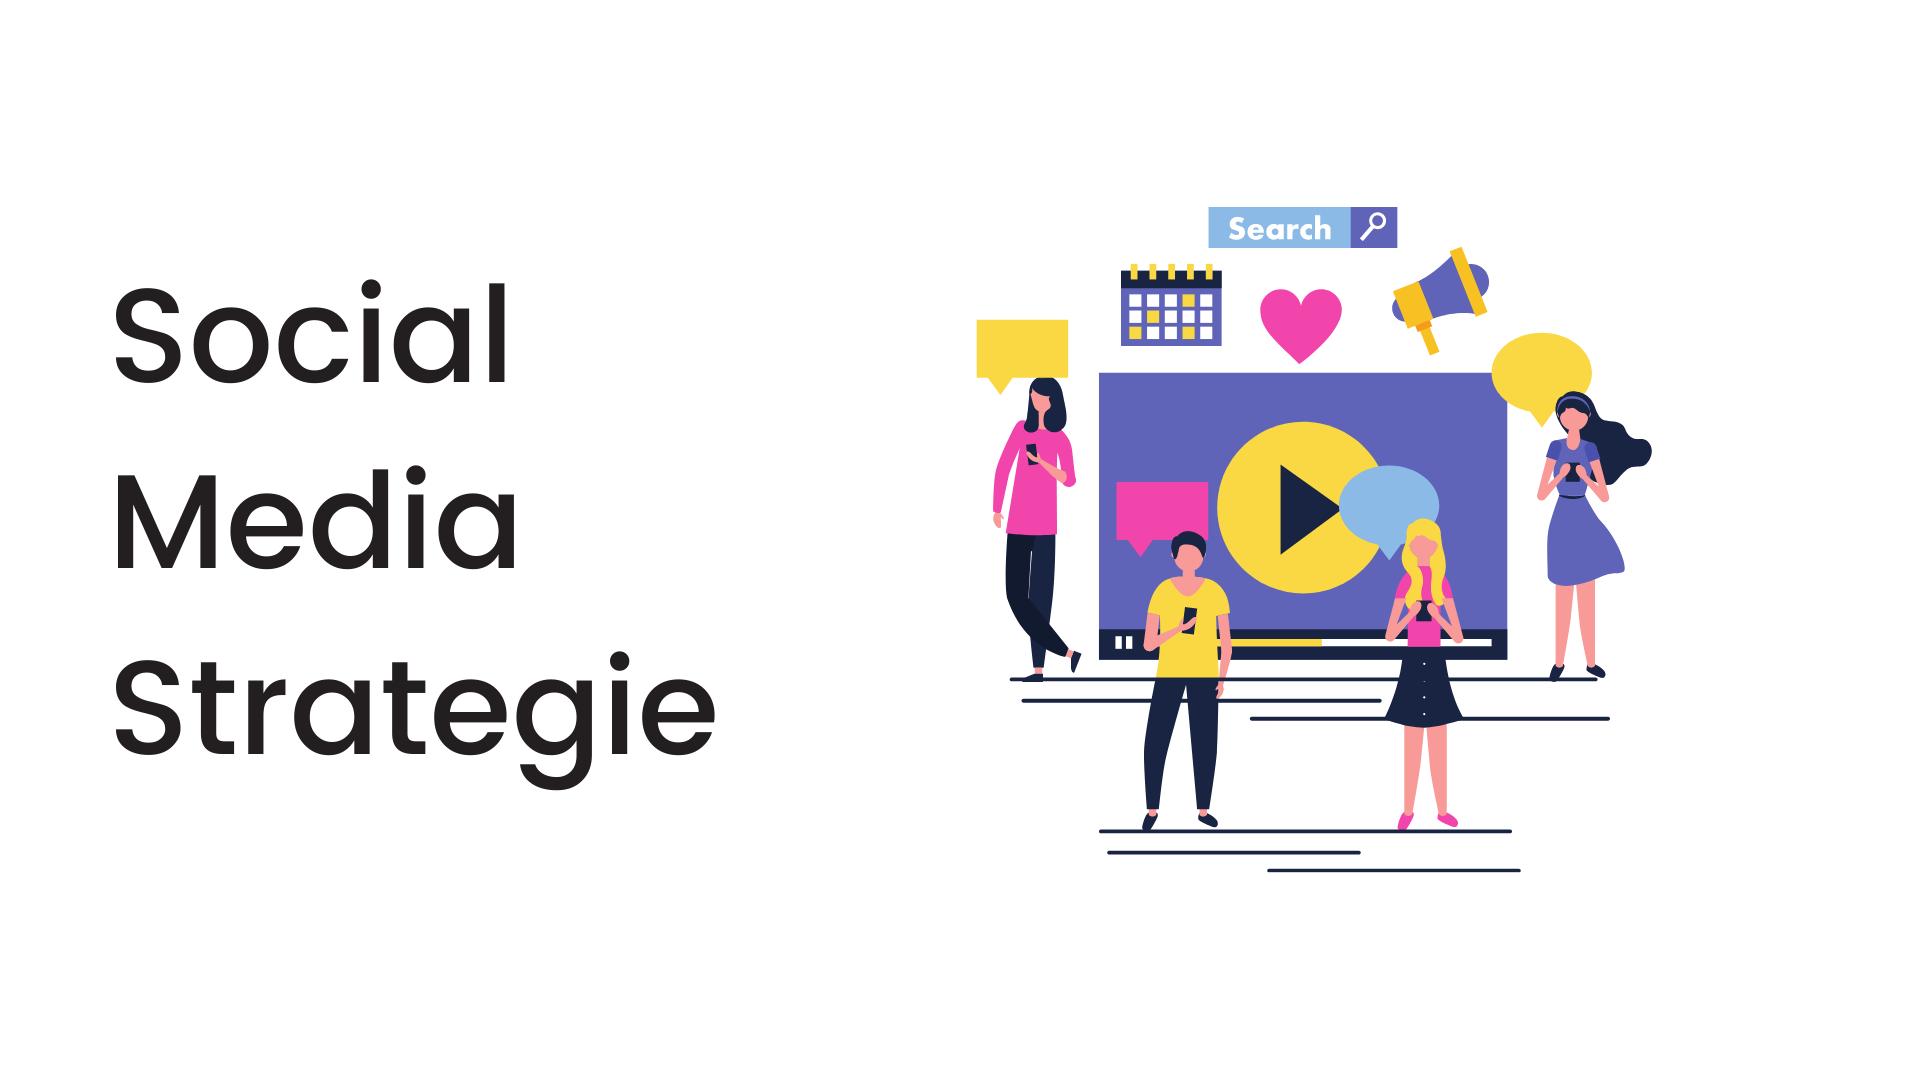 Digital_Coach_Academy_Personal_Branding_Architect_Social_Media